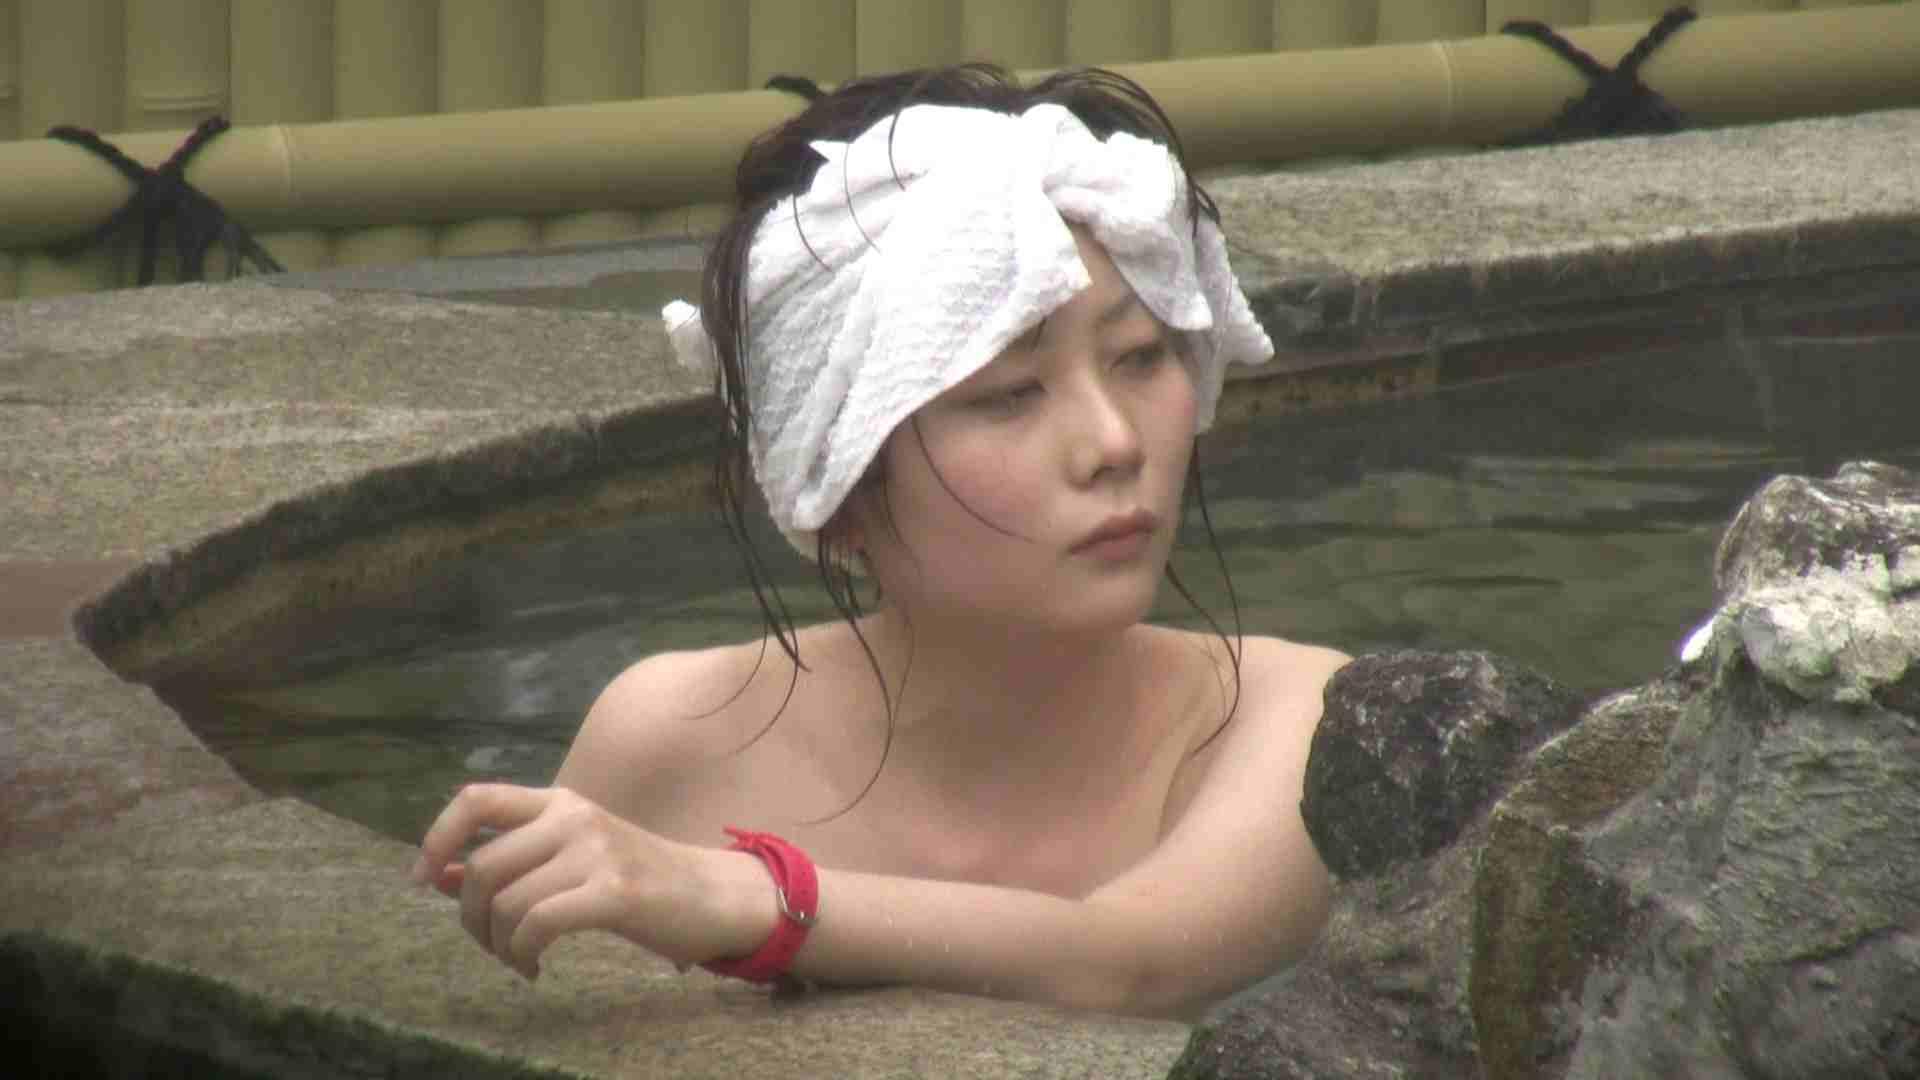 Aquaな露天風呂Vol.147 盗撮 | OLセックス  85画像 31